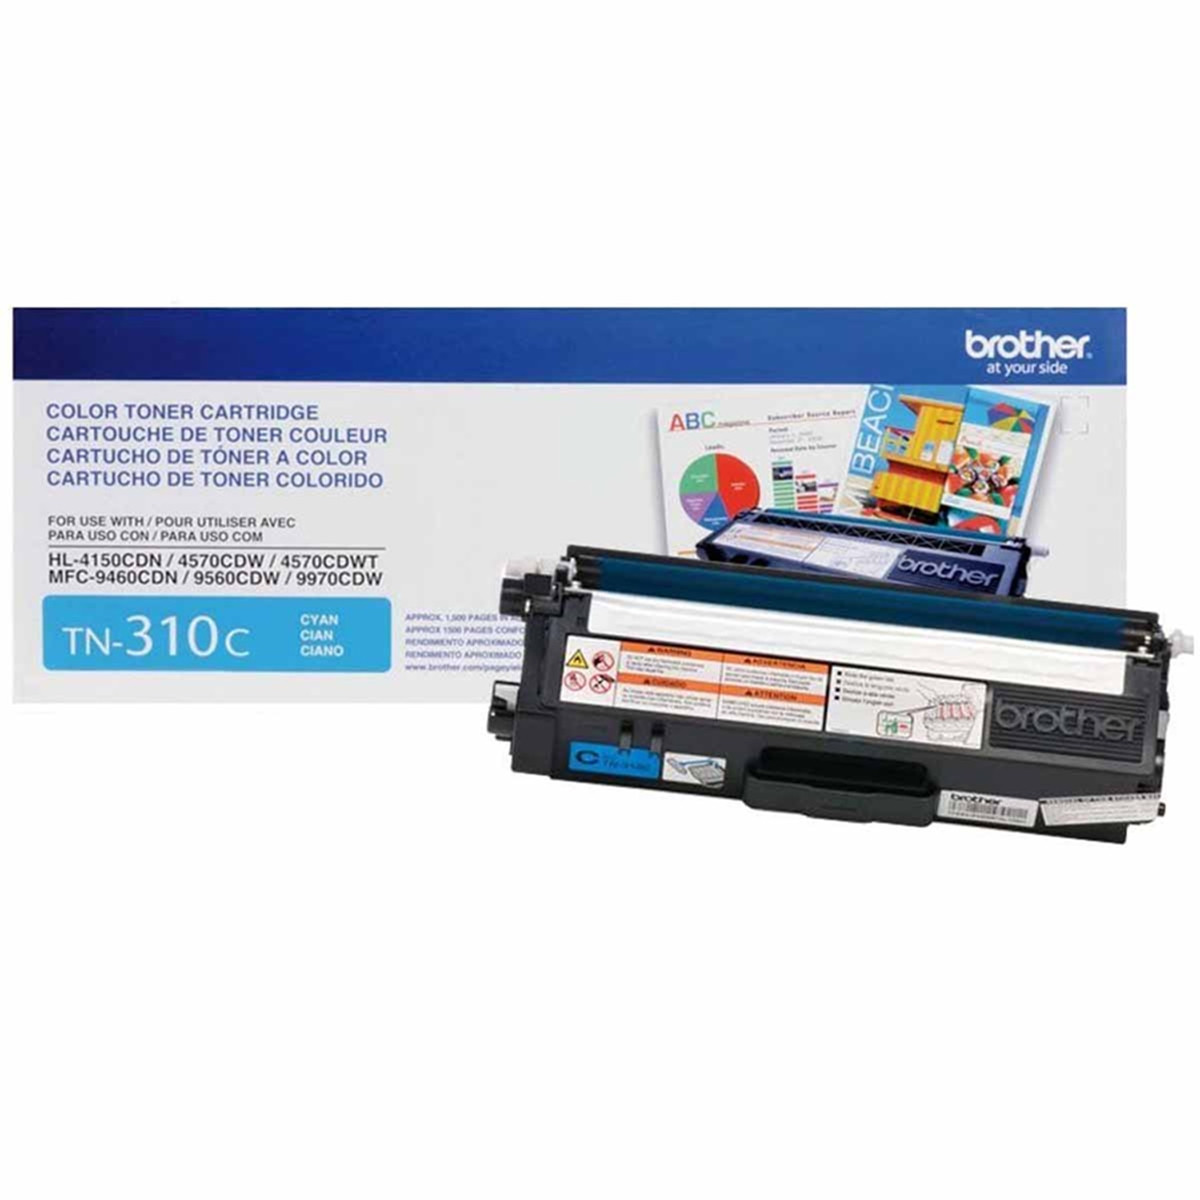 Toner Brother TN310 TN310C Ciano | HL4150 HL4570 MFC9970 MFC9460 MFC9560 | Original 1.5k